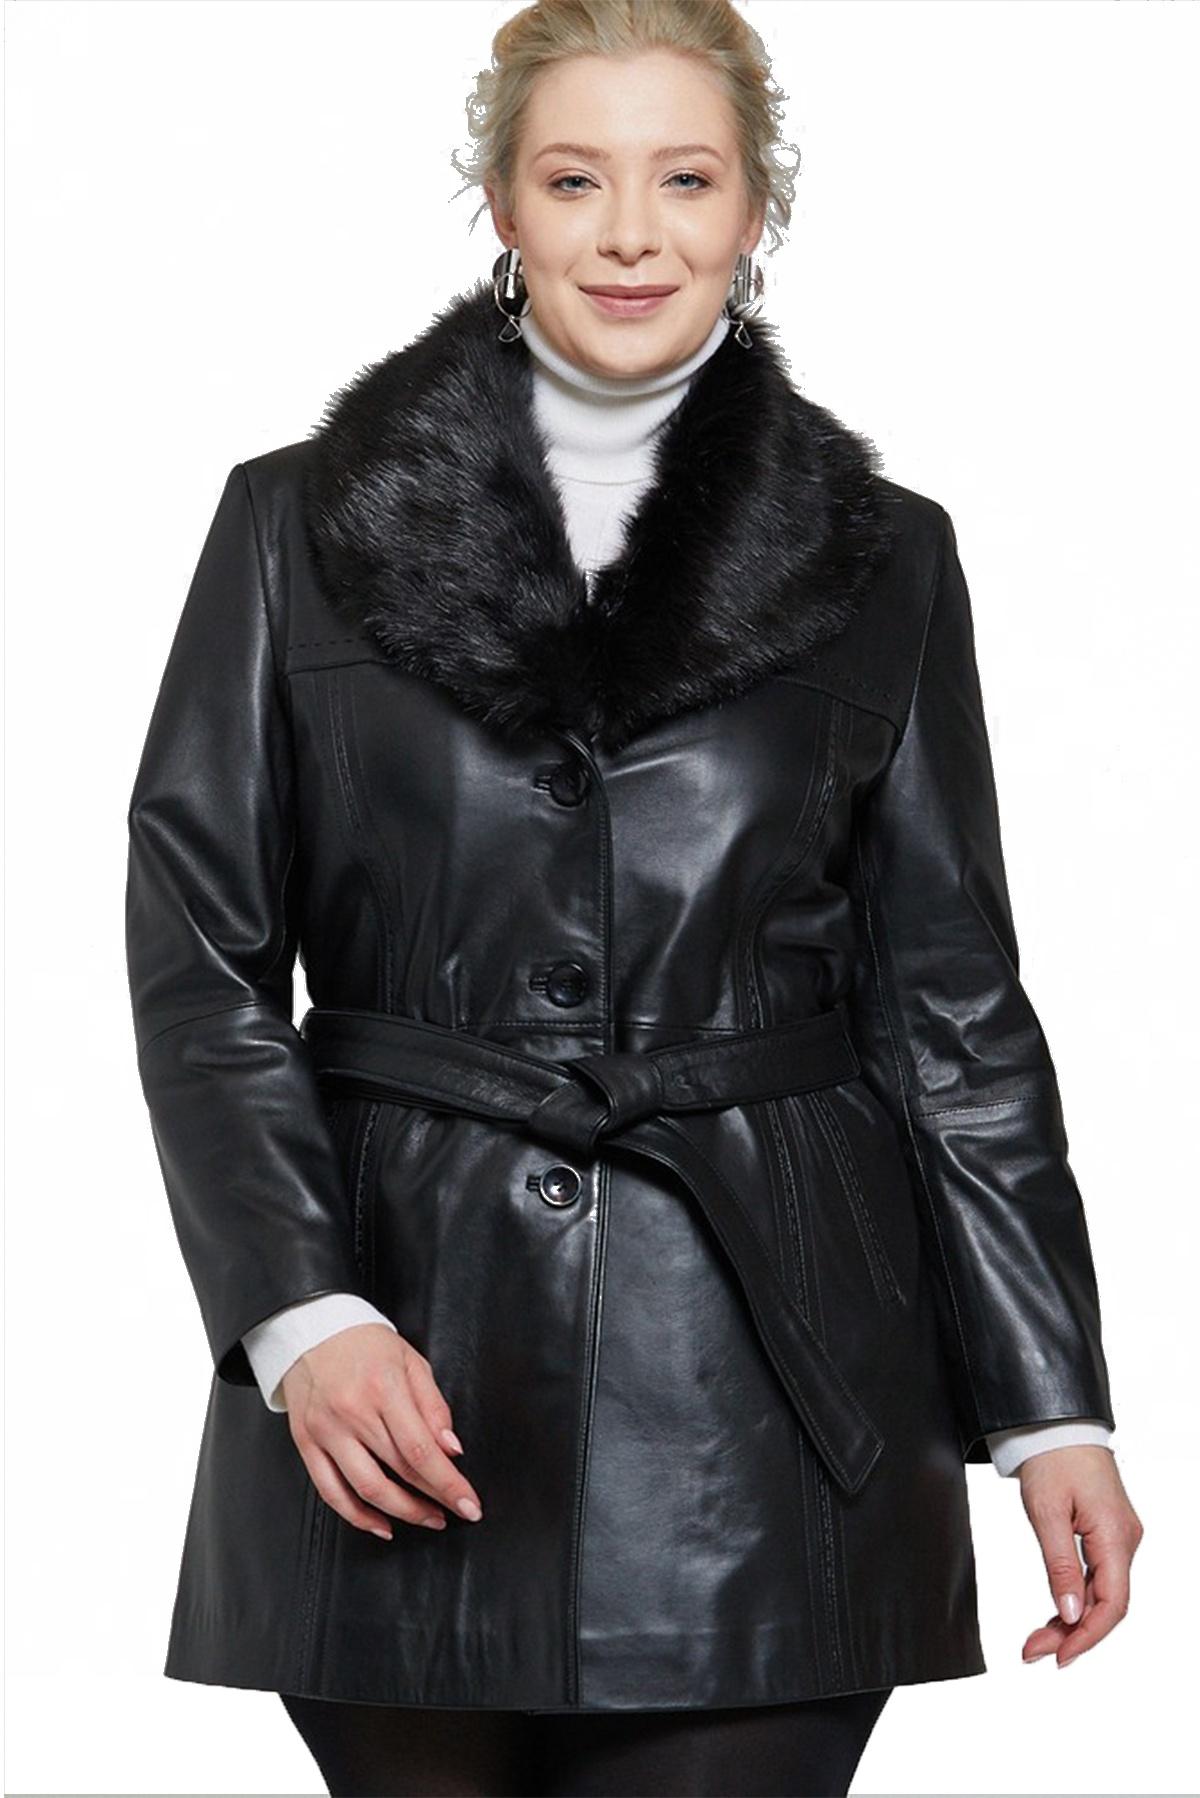 real leather varsity jacket